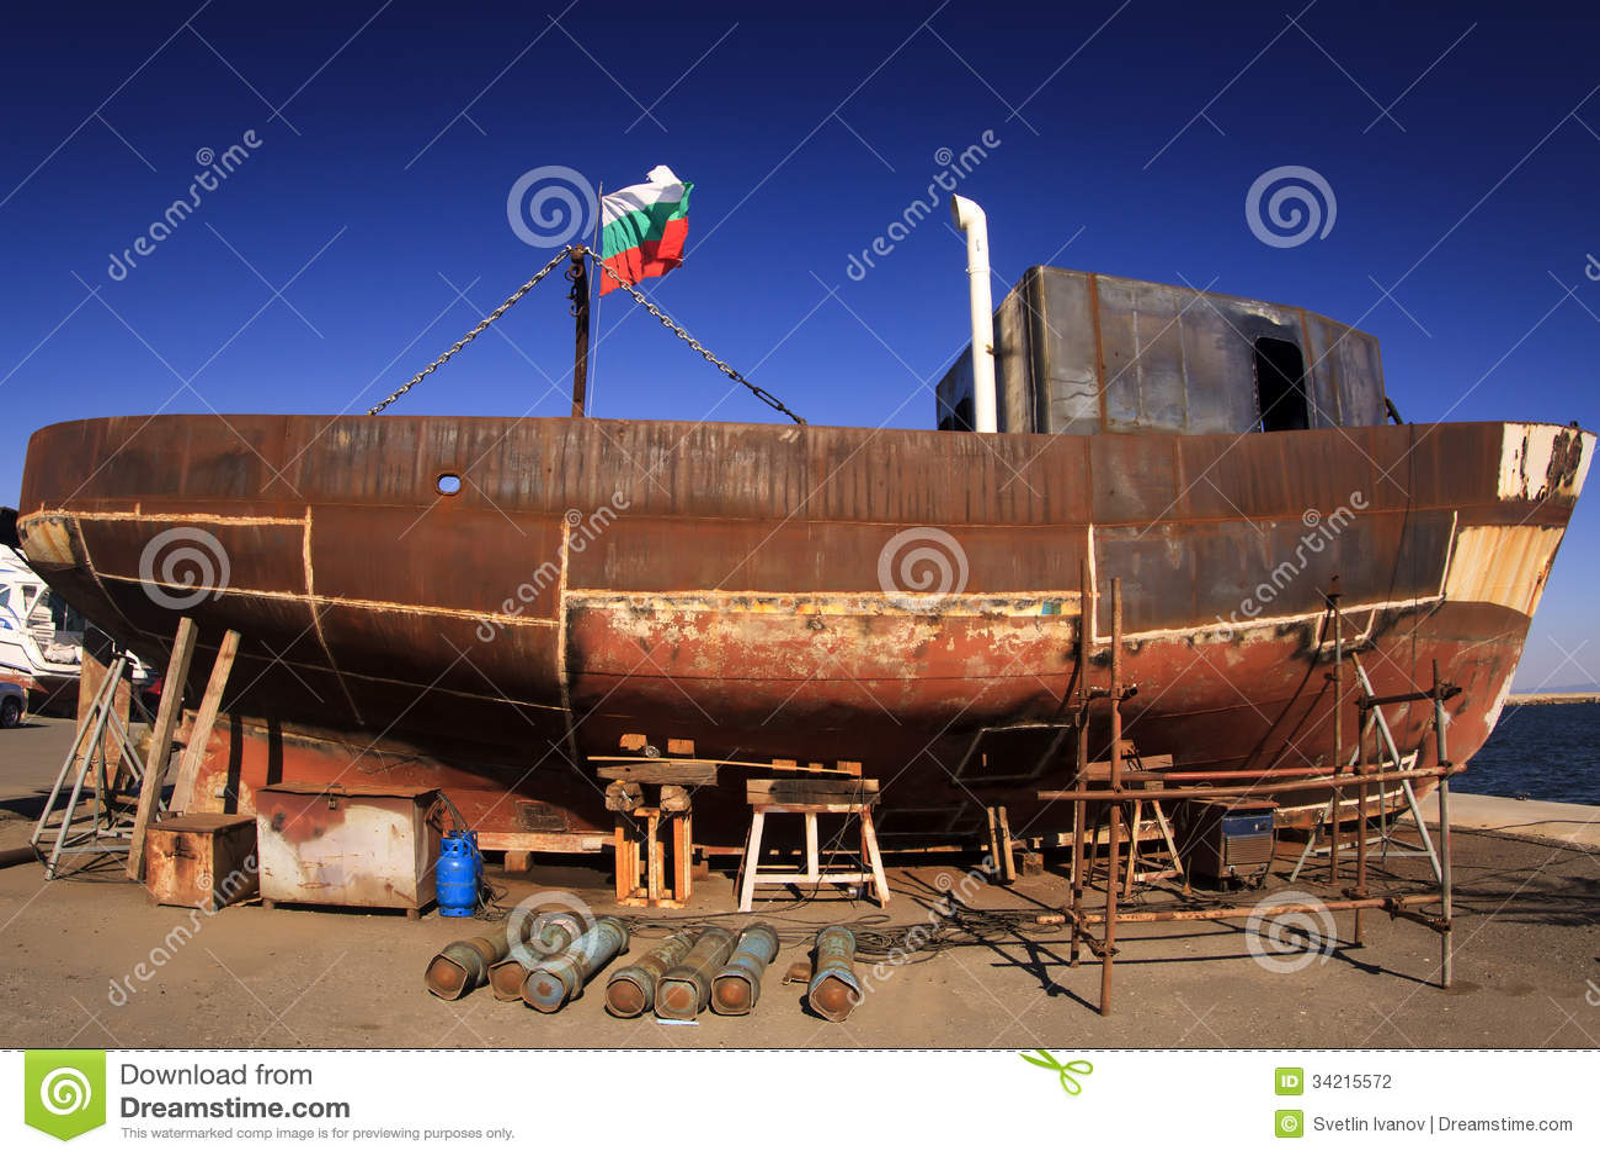 Unfinished old fishing boat ship at the shipyard in Sozopol,Bulgaria.